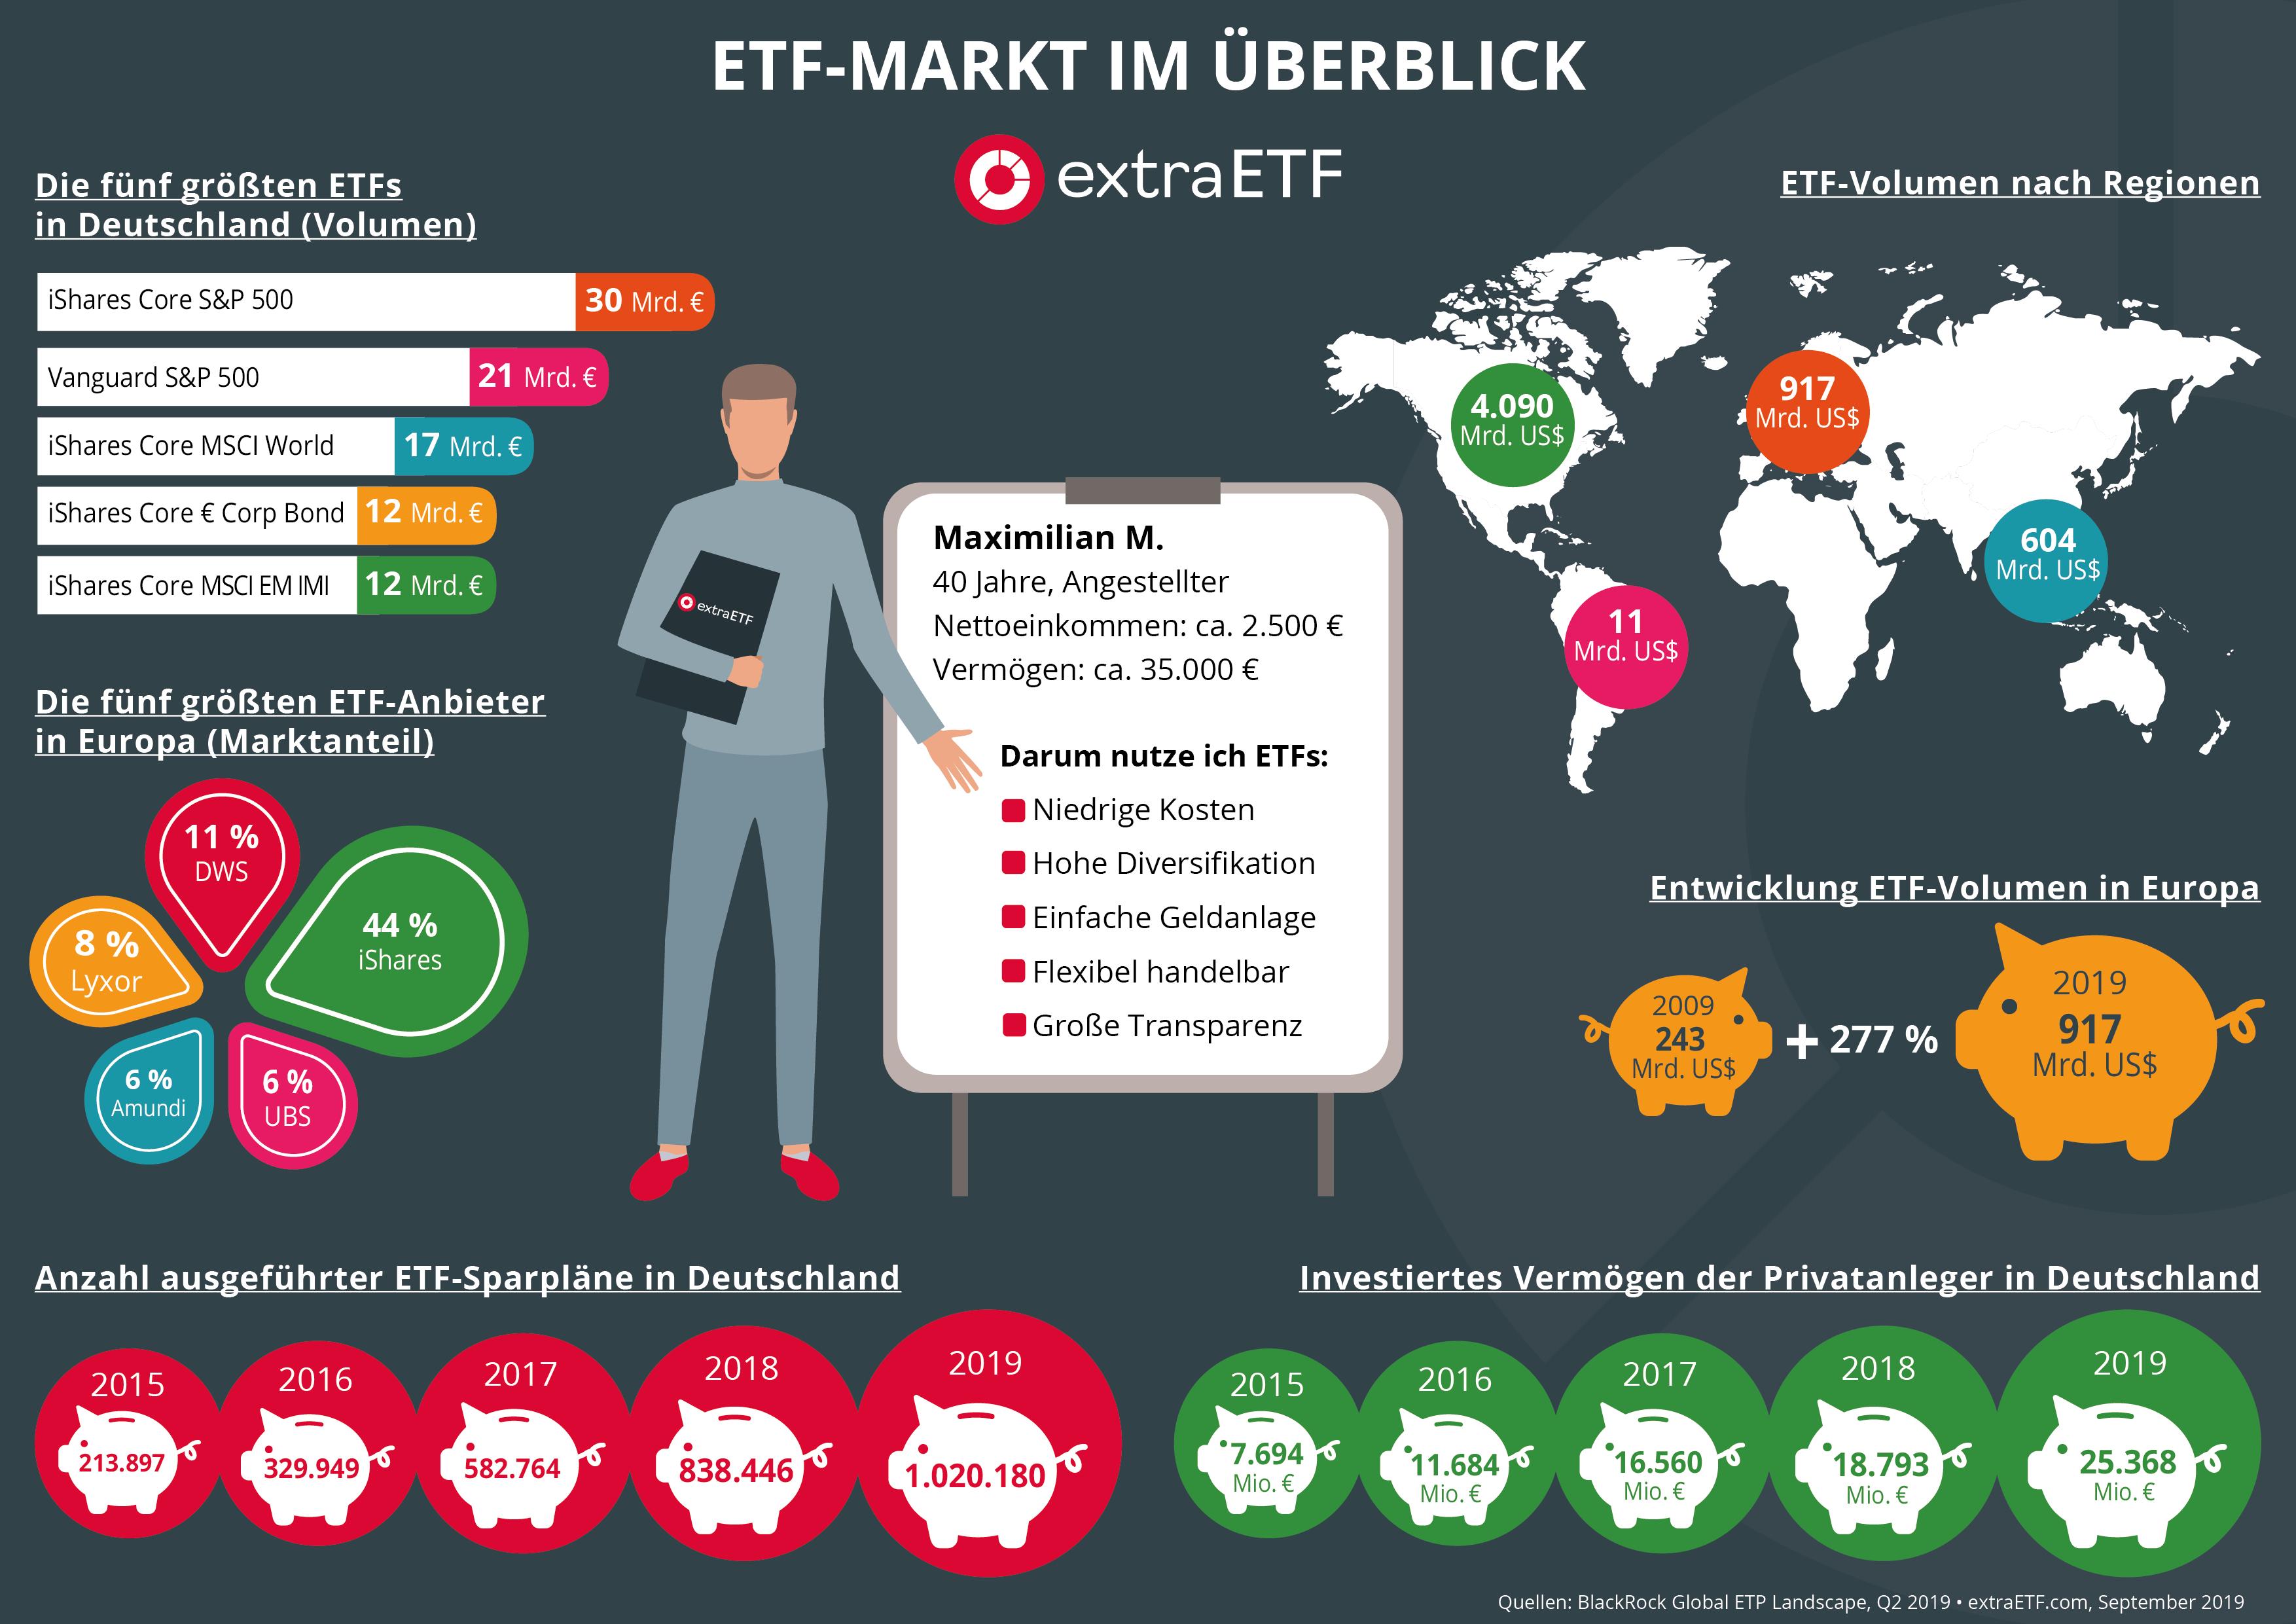 ETF Infografik zum ETF-Markt